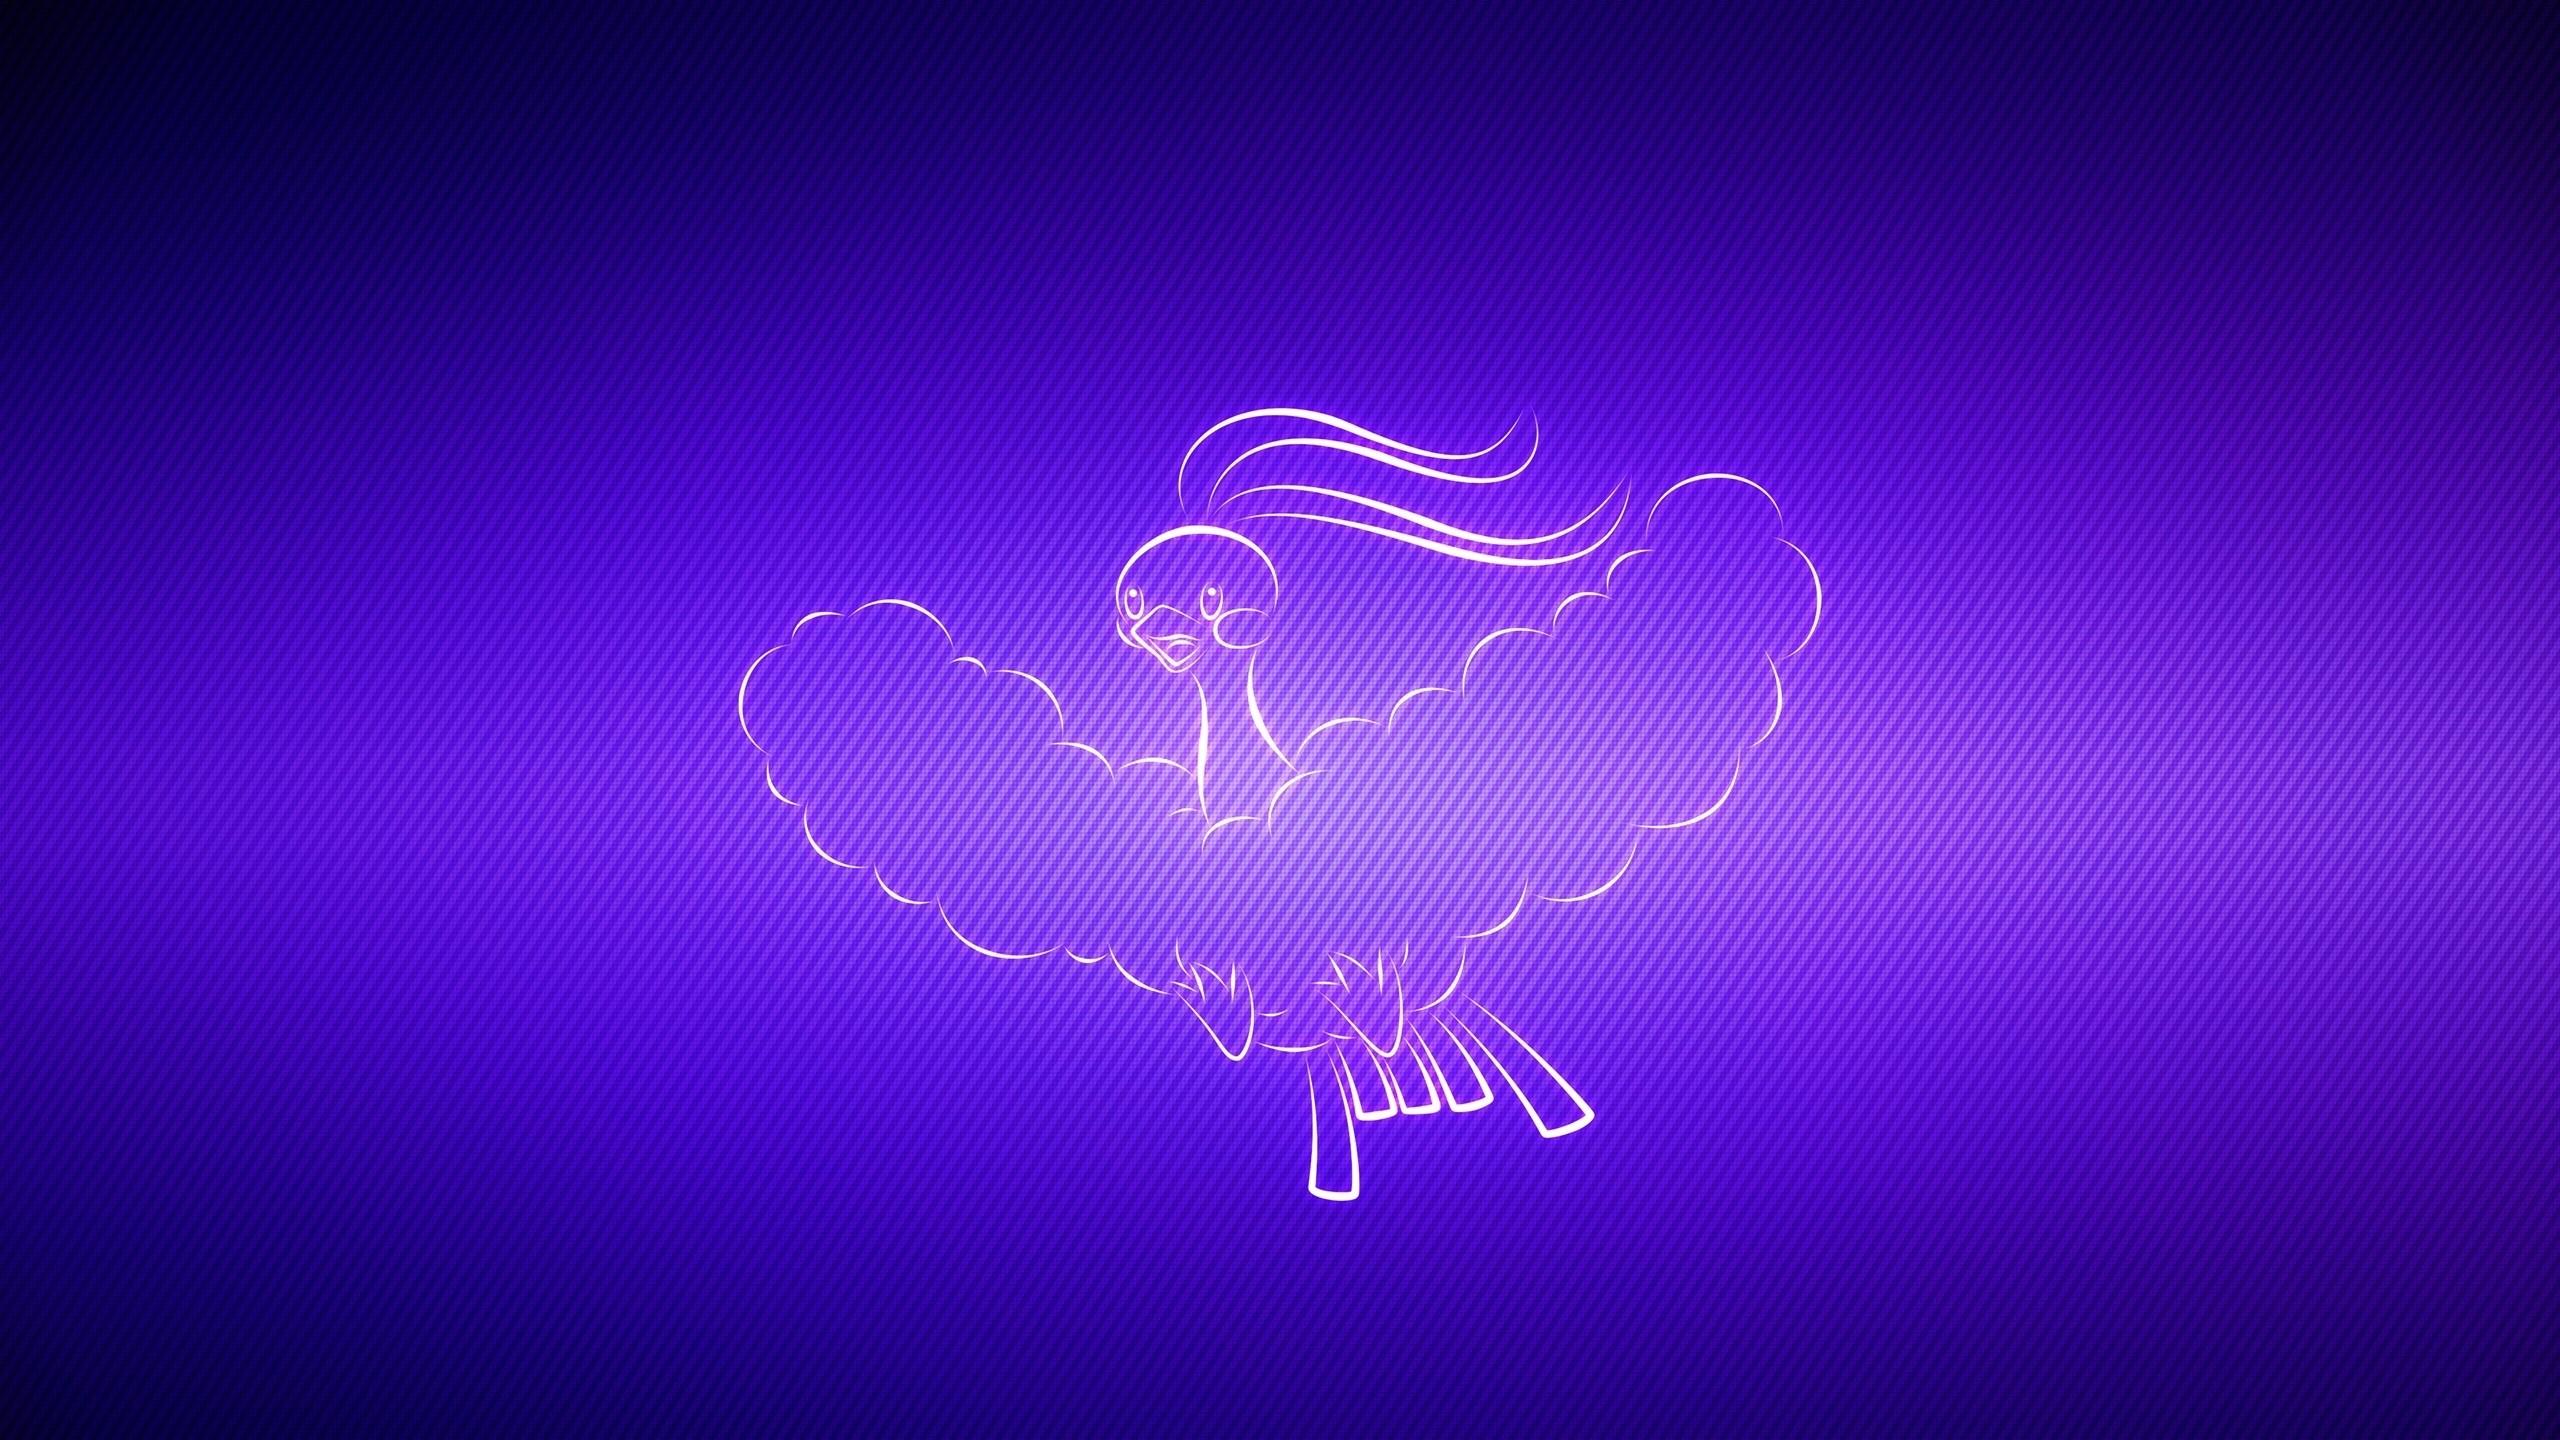 Wallpaper altaria, flight, pokemon, background